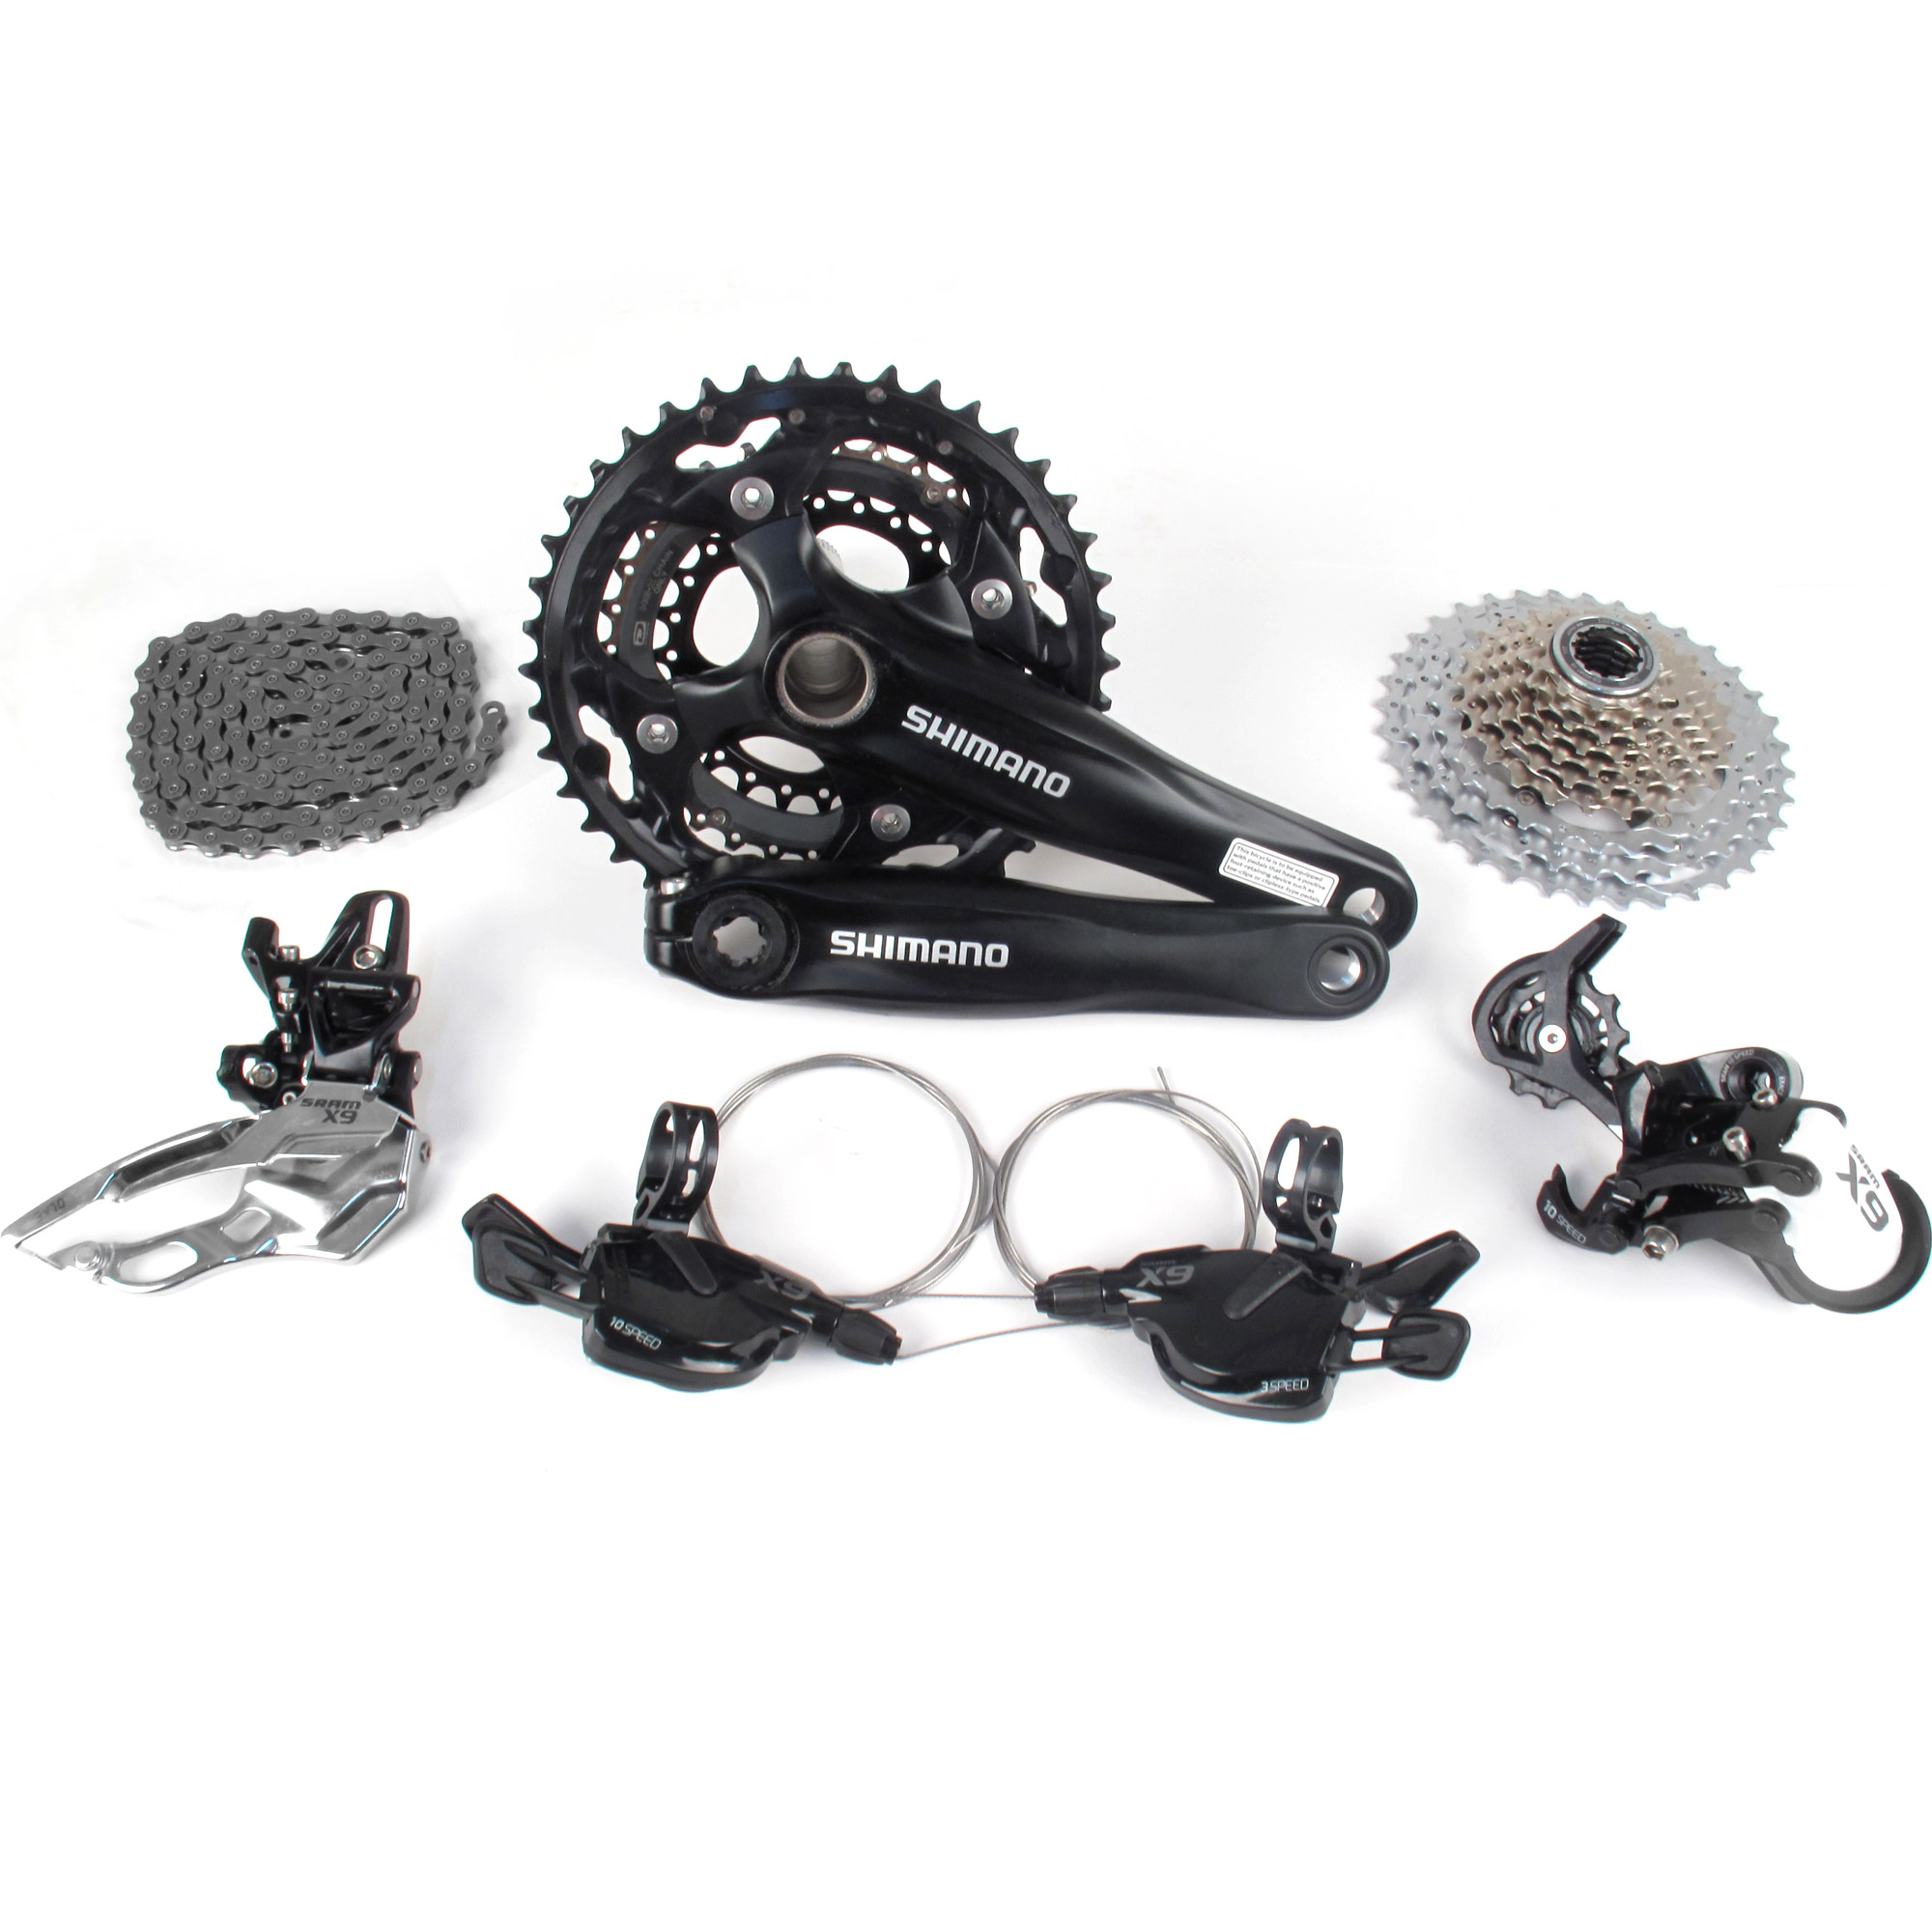 SRAM X9 SHIMANO SLX Mountain Bike Crankset Groupset 3x10 Speed // FC-M552 / HG81   eBay